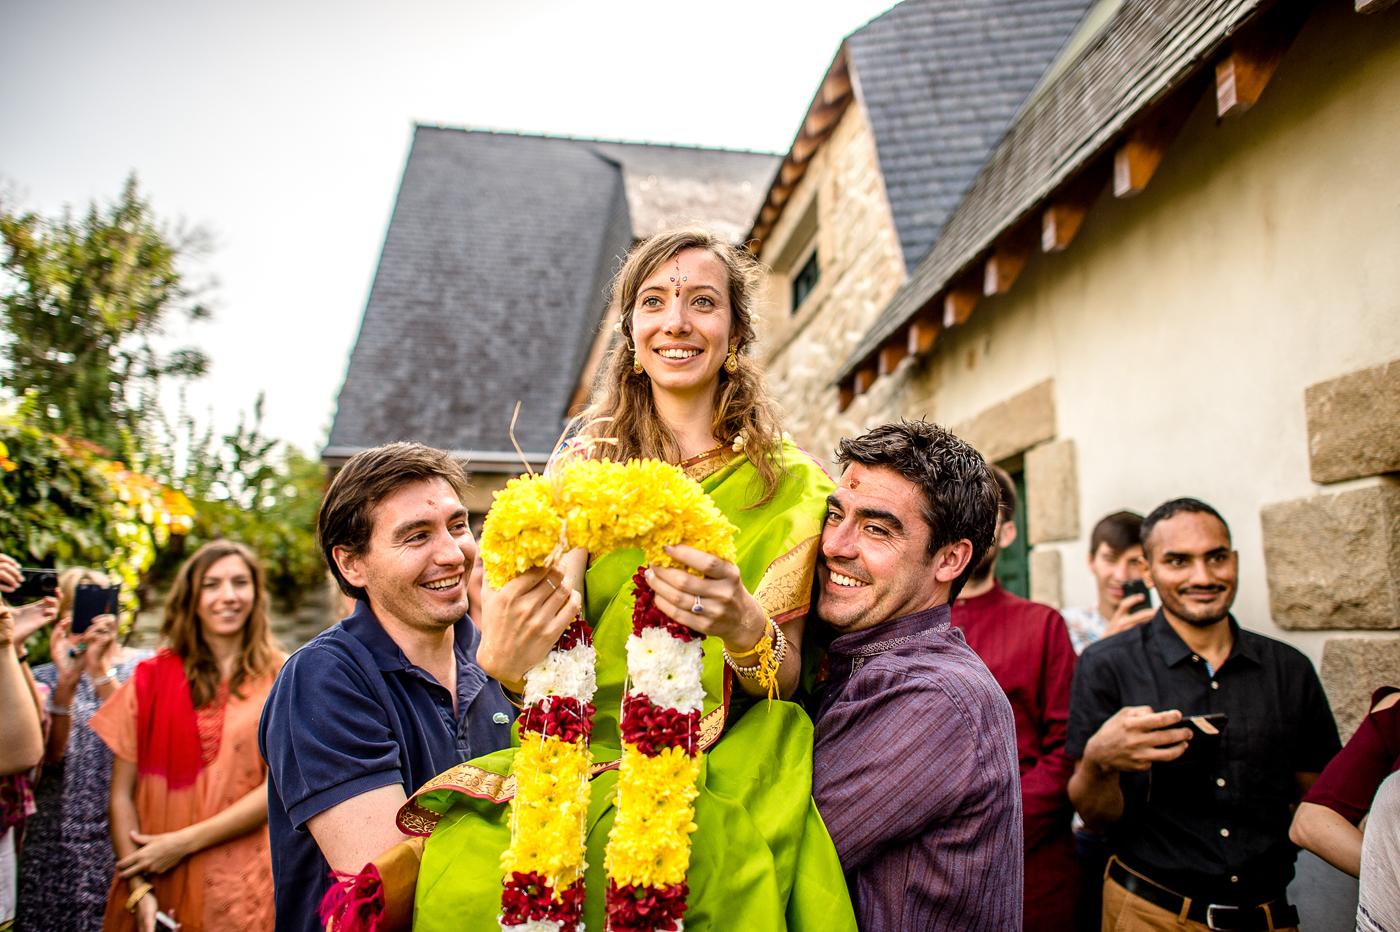 Gaelle Le Berre